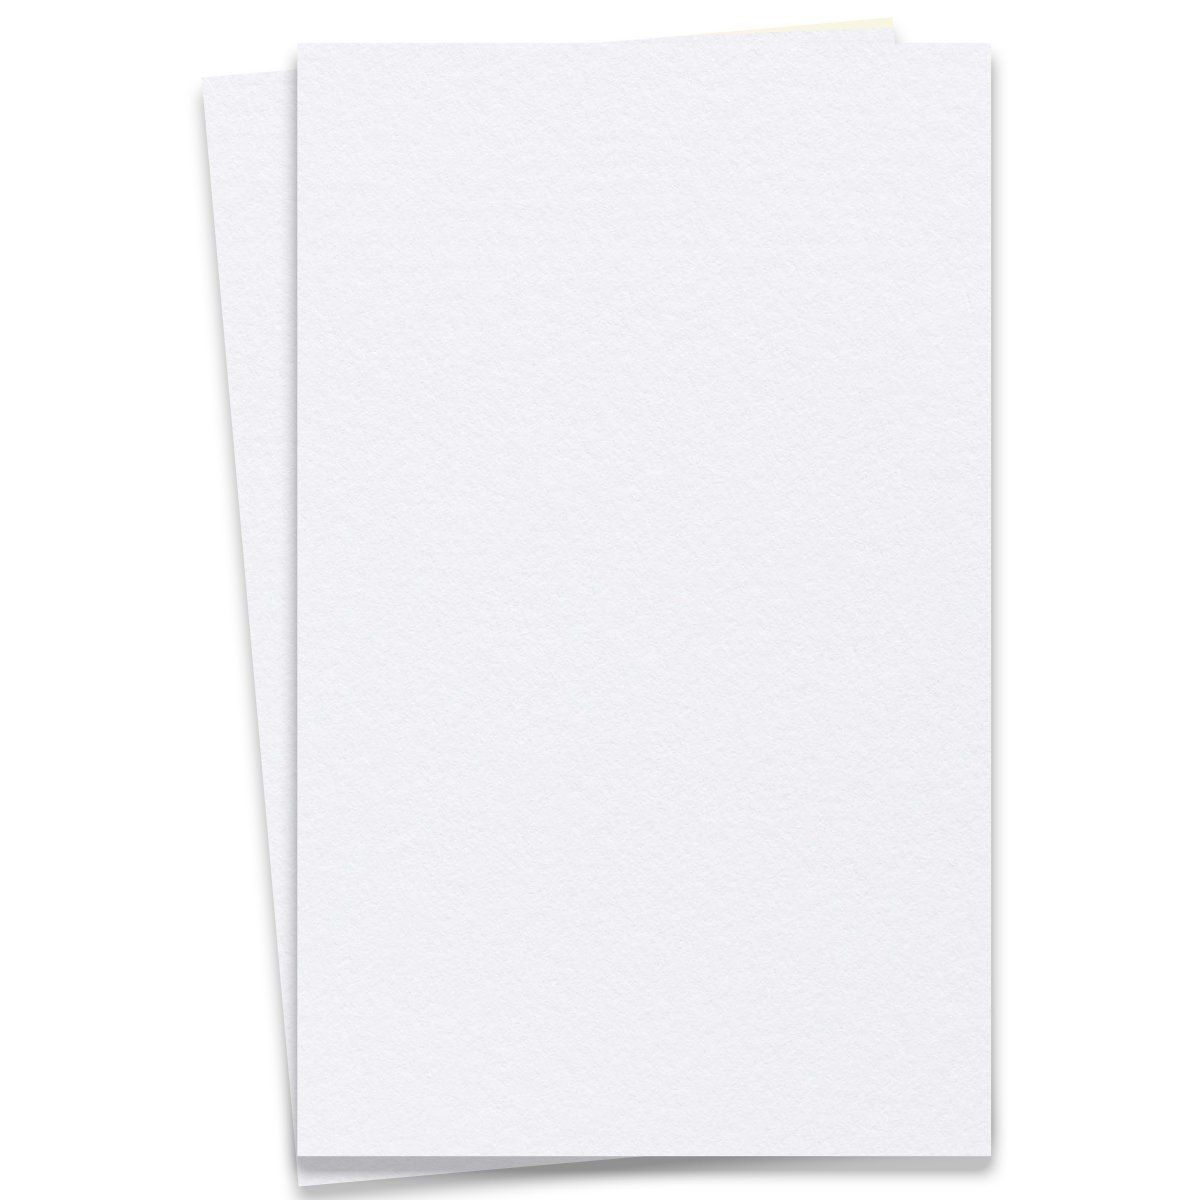 Lettra Cotton Fluorescent White 11x17 Ledger Size Paper 110lb Cover 297gsm 100 Pk Paper 11x17 Metallic Paper